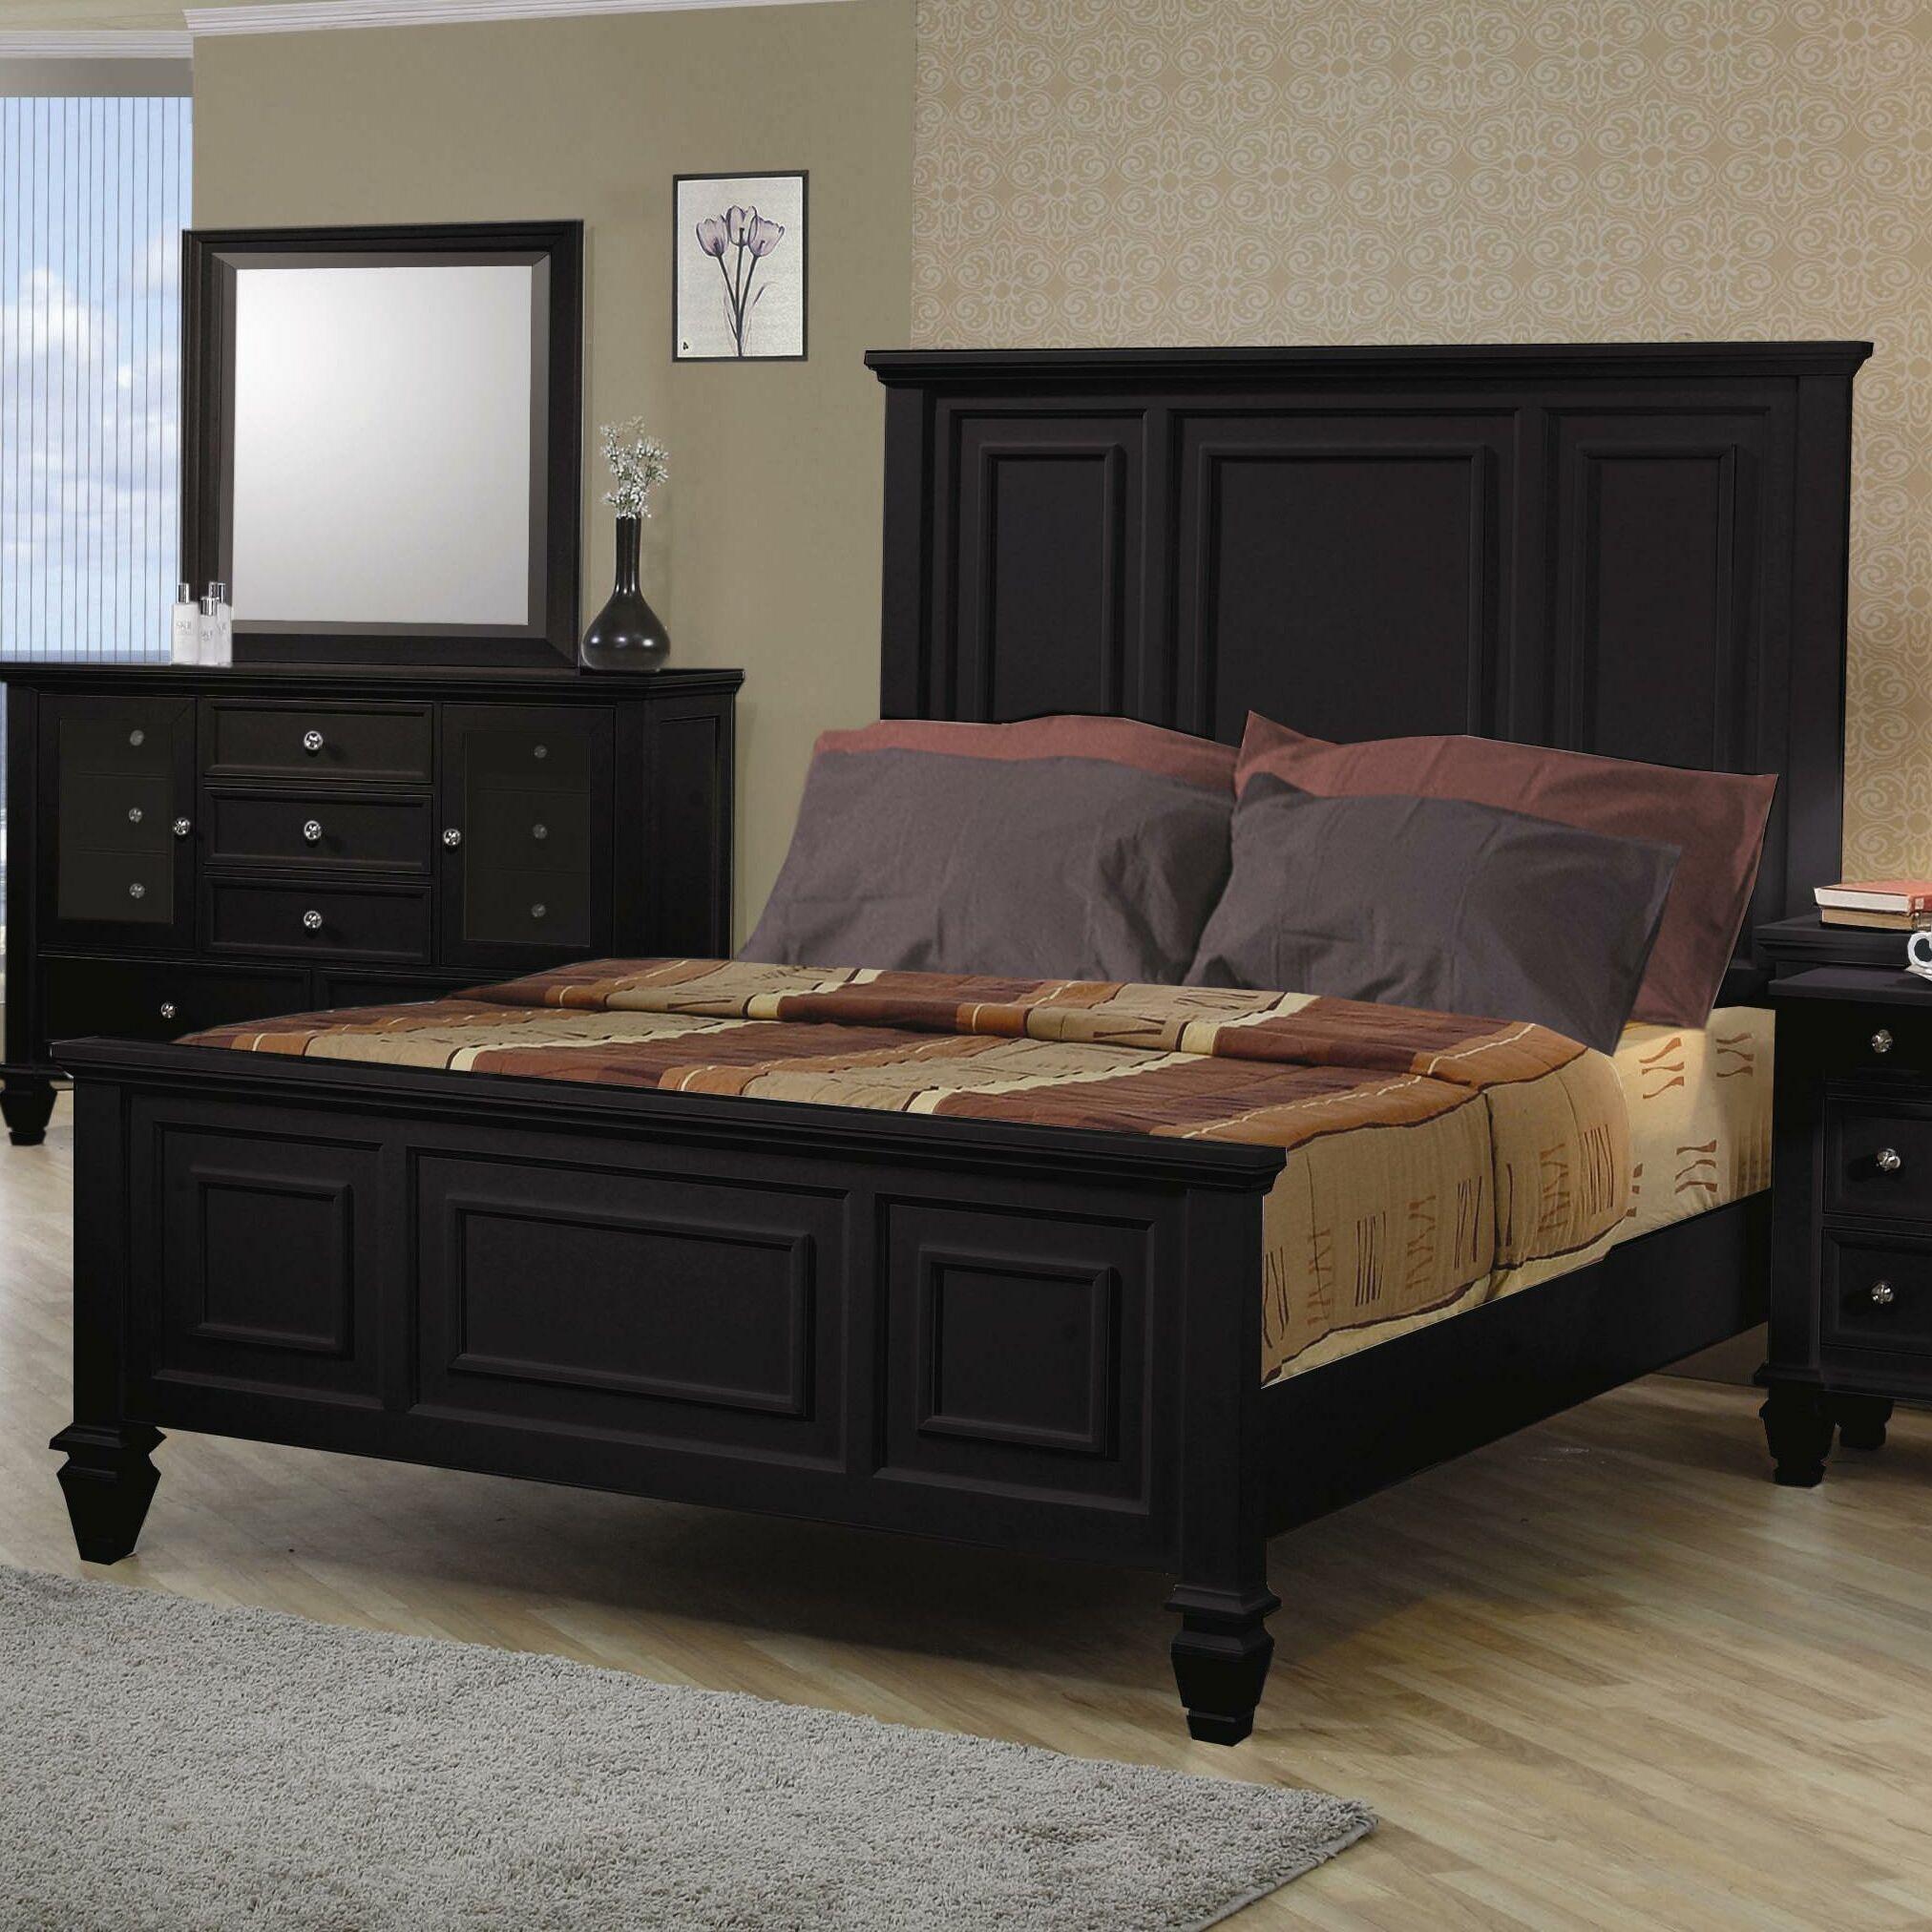 Ellis High Headboard Panel Bed Size: California King